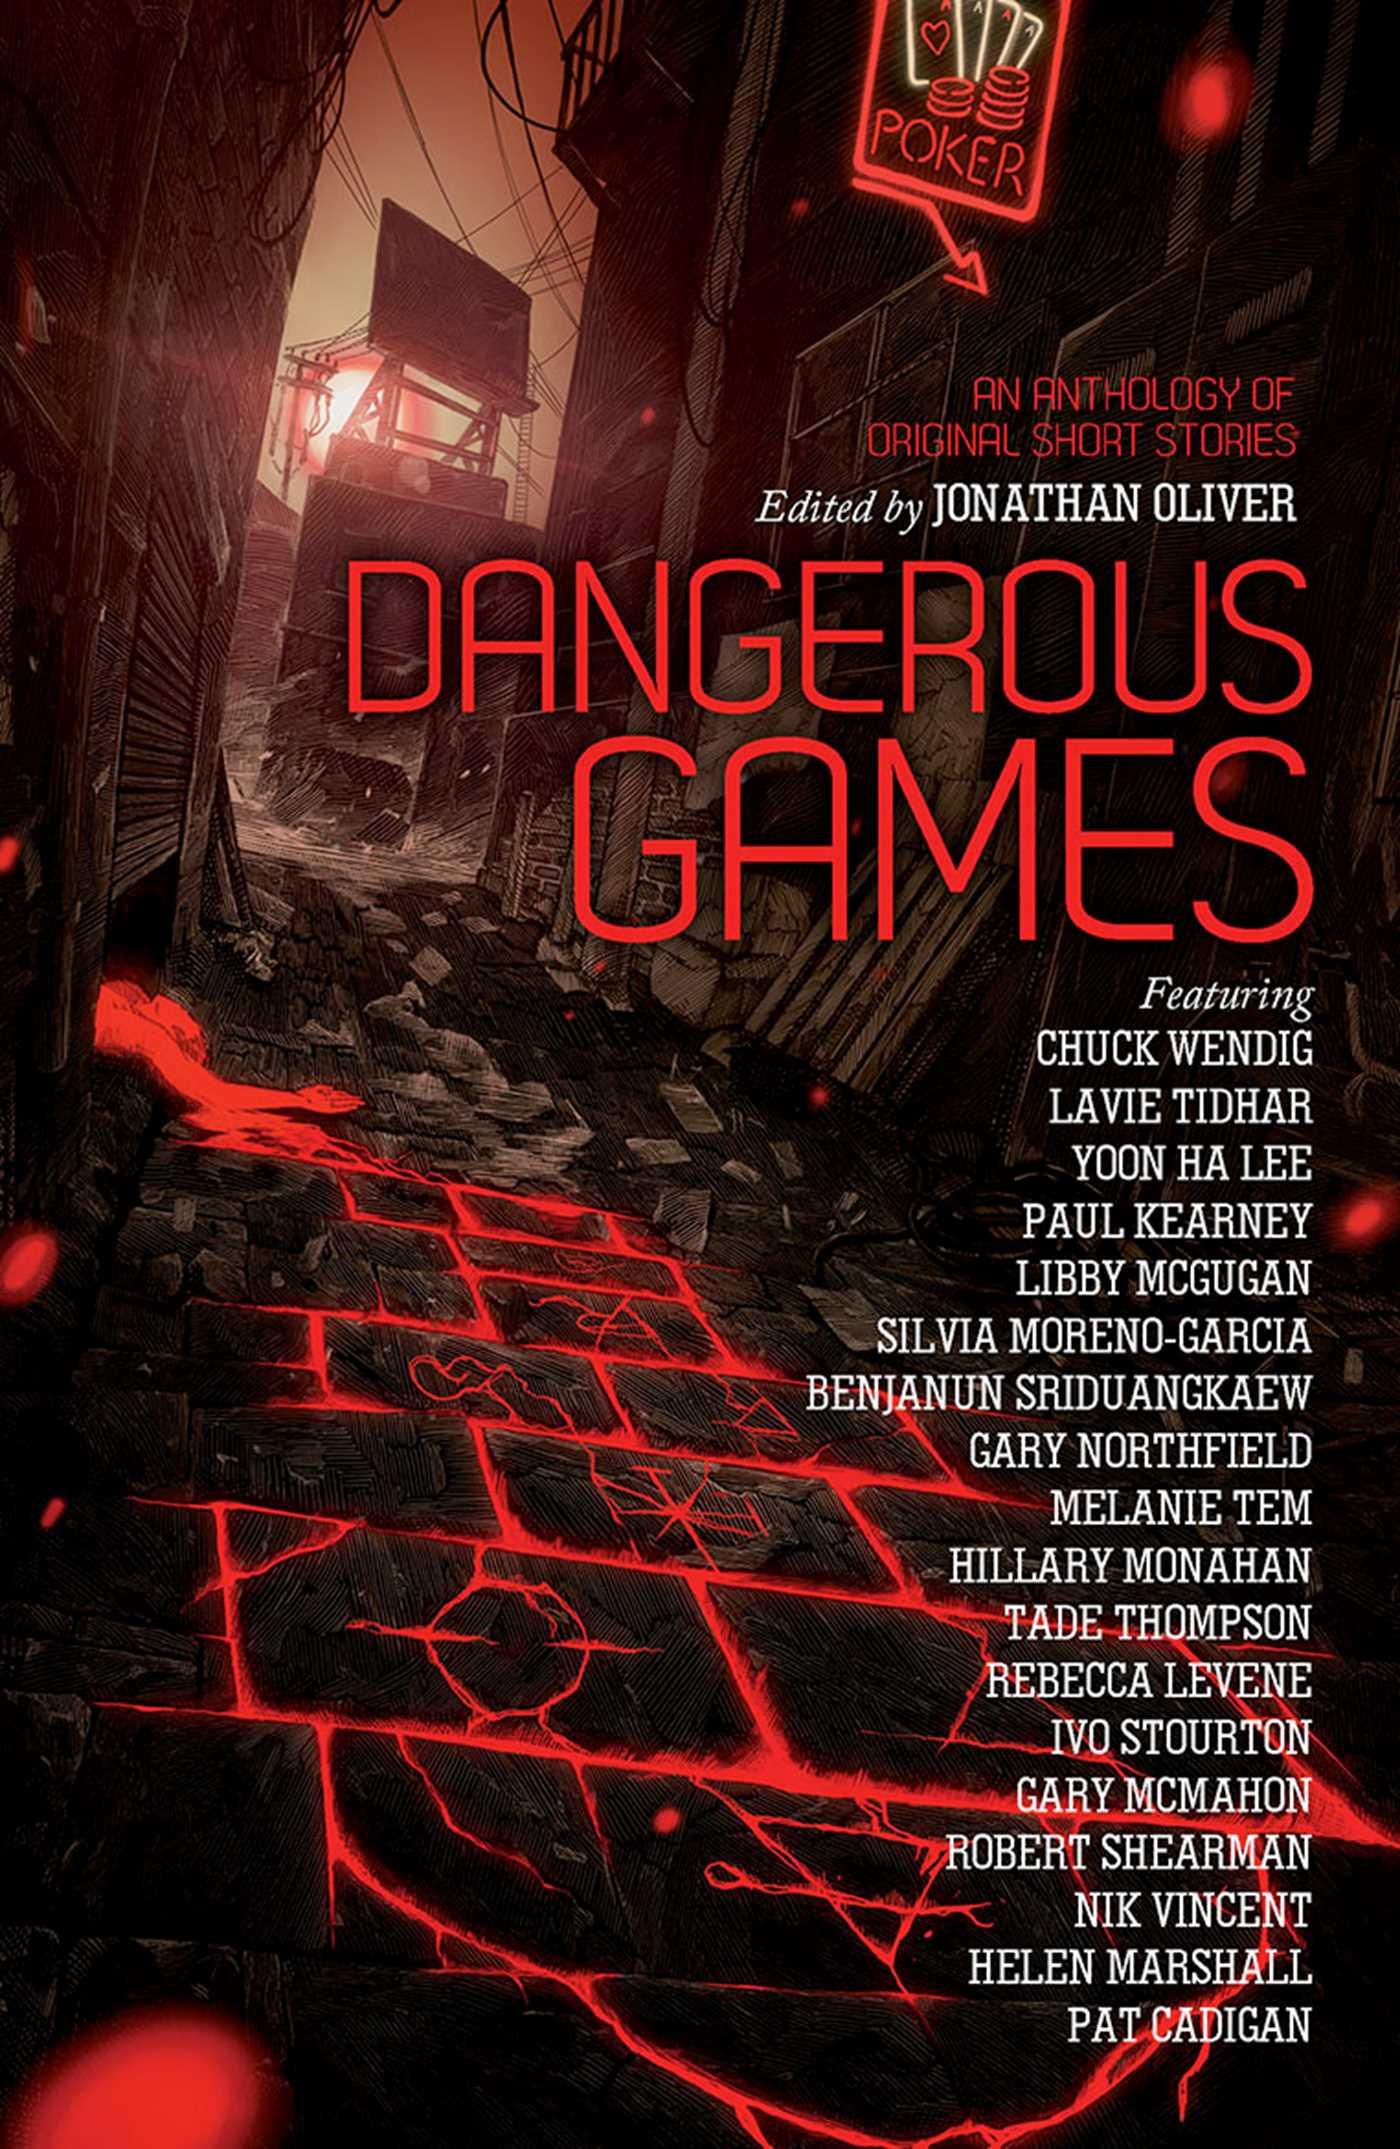 Dangerous games 9781781082683 hr